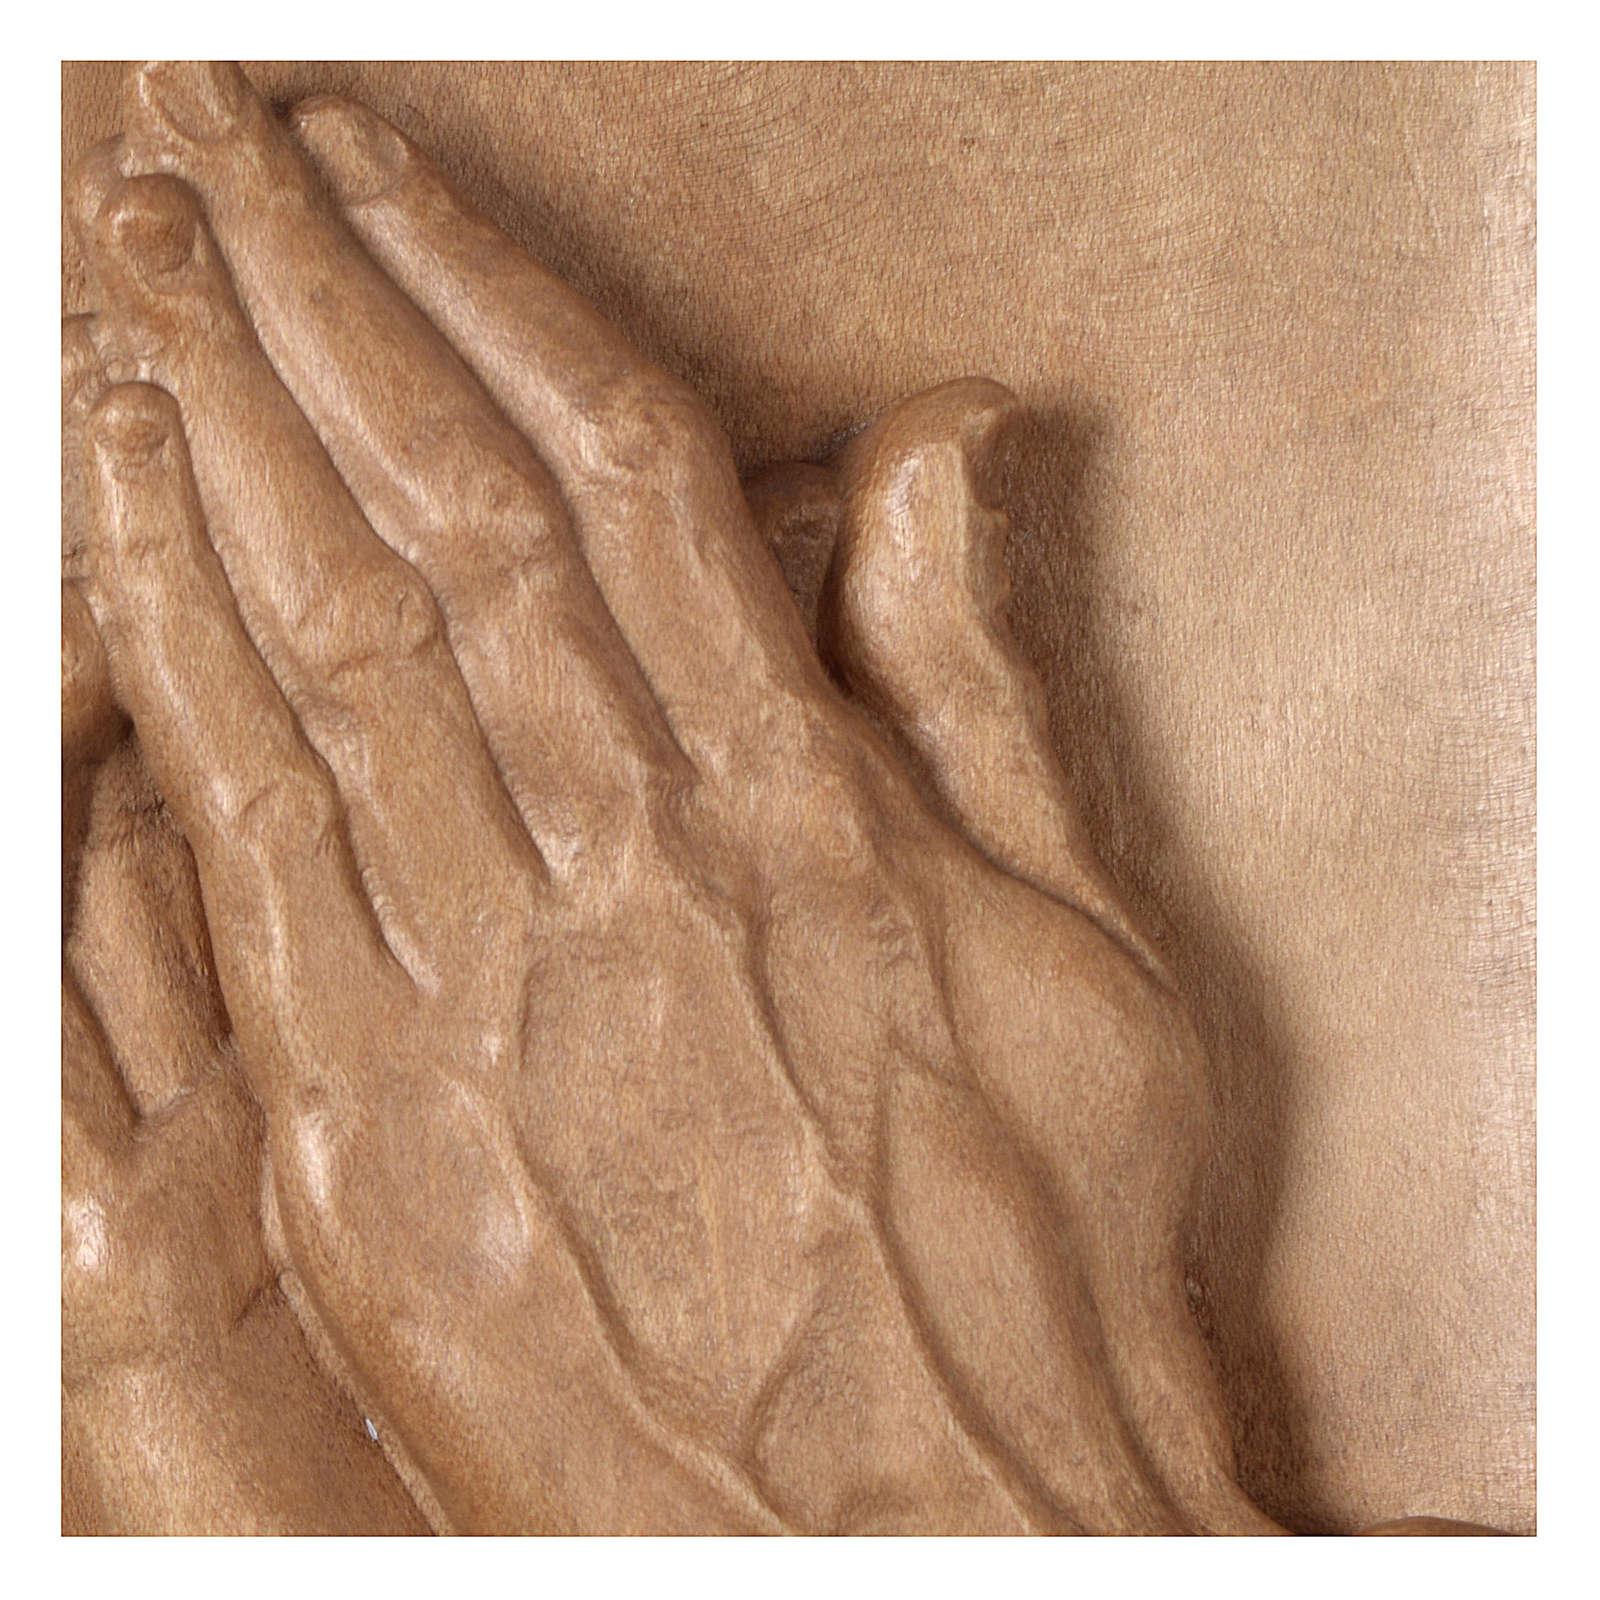 Bassorilievo mani giunte legno Valgardena patinato 4